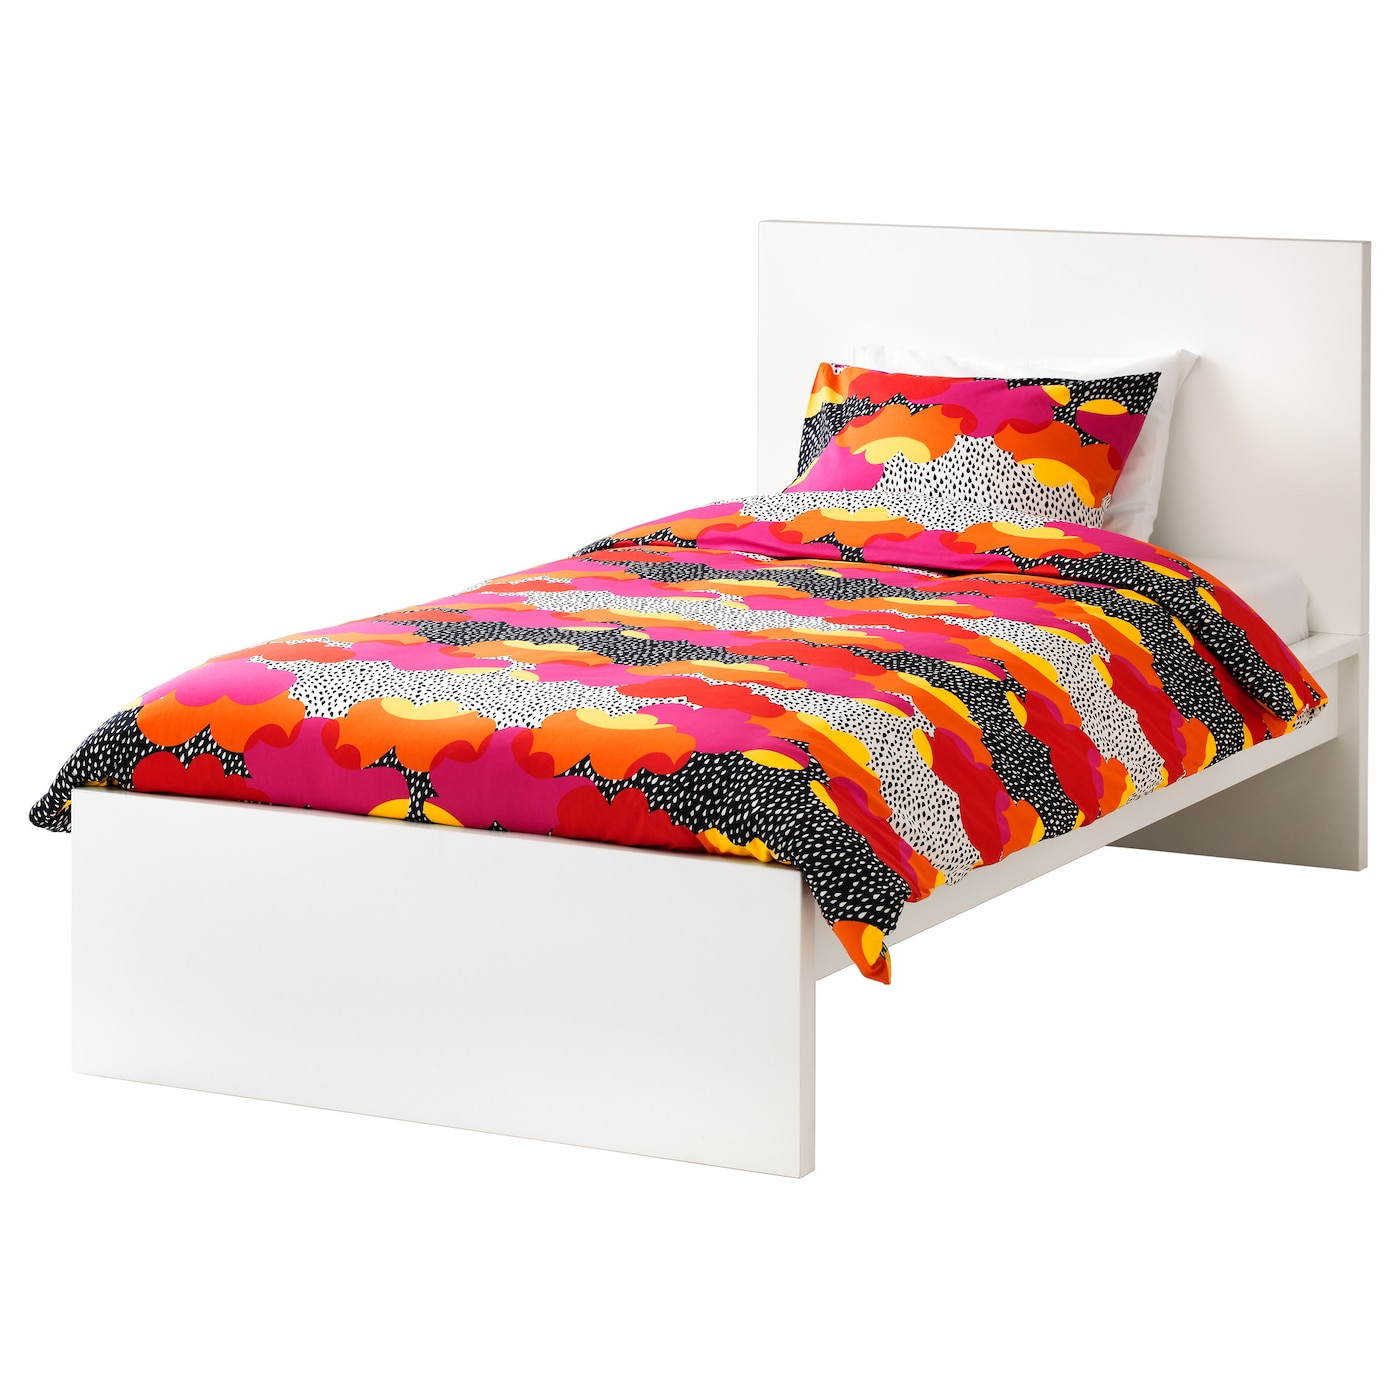 lit 1 personne cadre de lit ikea. Black Bedroom Furniture Sets. Home Design Ideas